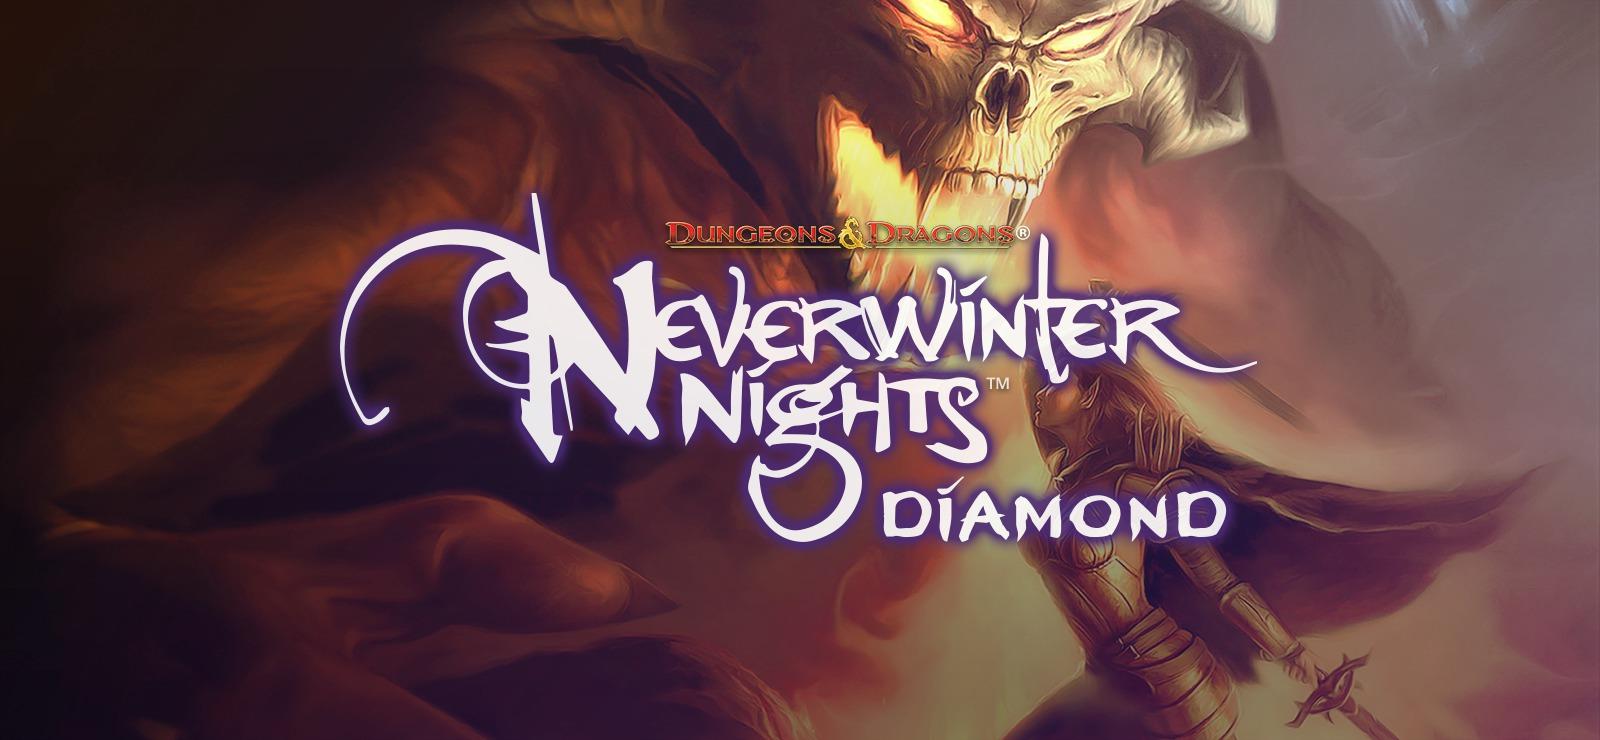 Descargar Neverwinter Nights Diamond para pc full en español mega y google drive